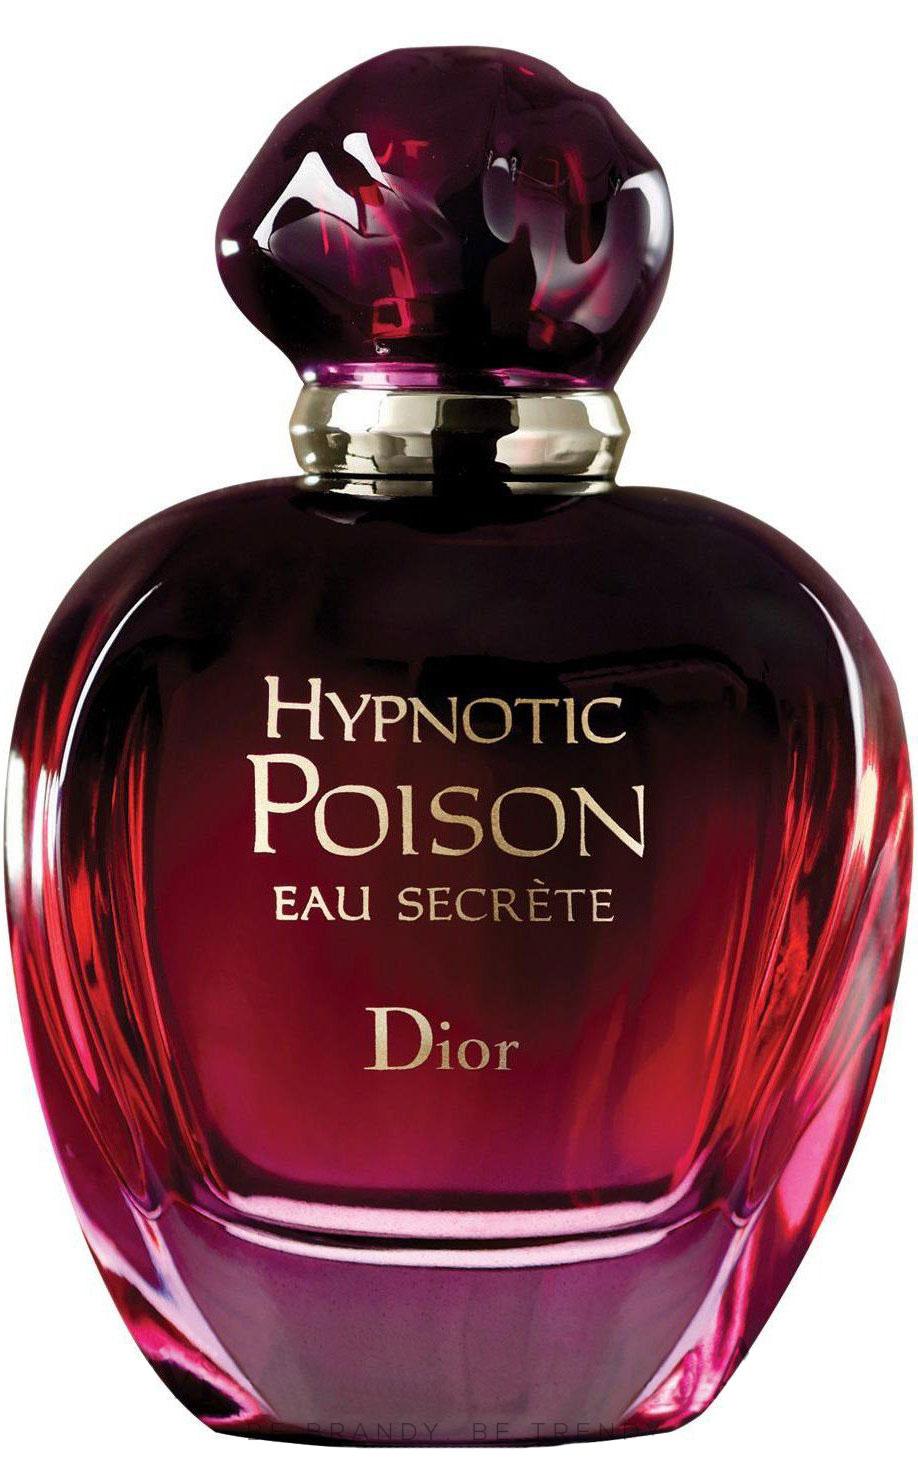 Christian Dior Hypnotic Poison Eau Secrete туалетная вода 100мл (Кристиан Диор Гипнотический Яд Секретная Вода)